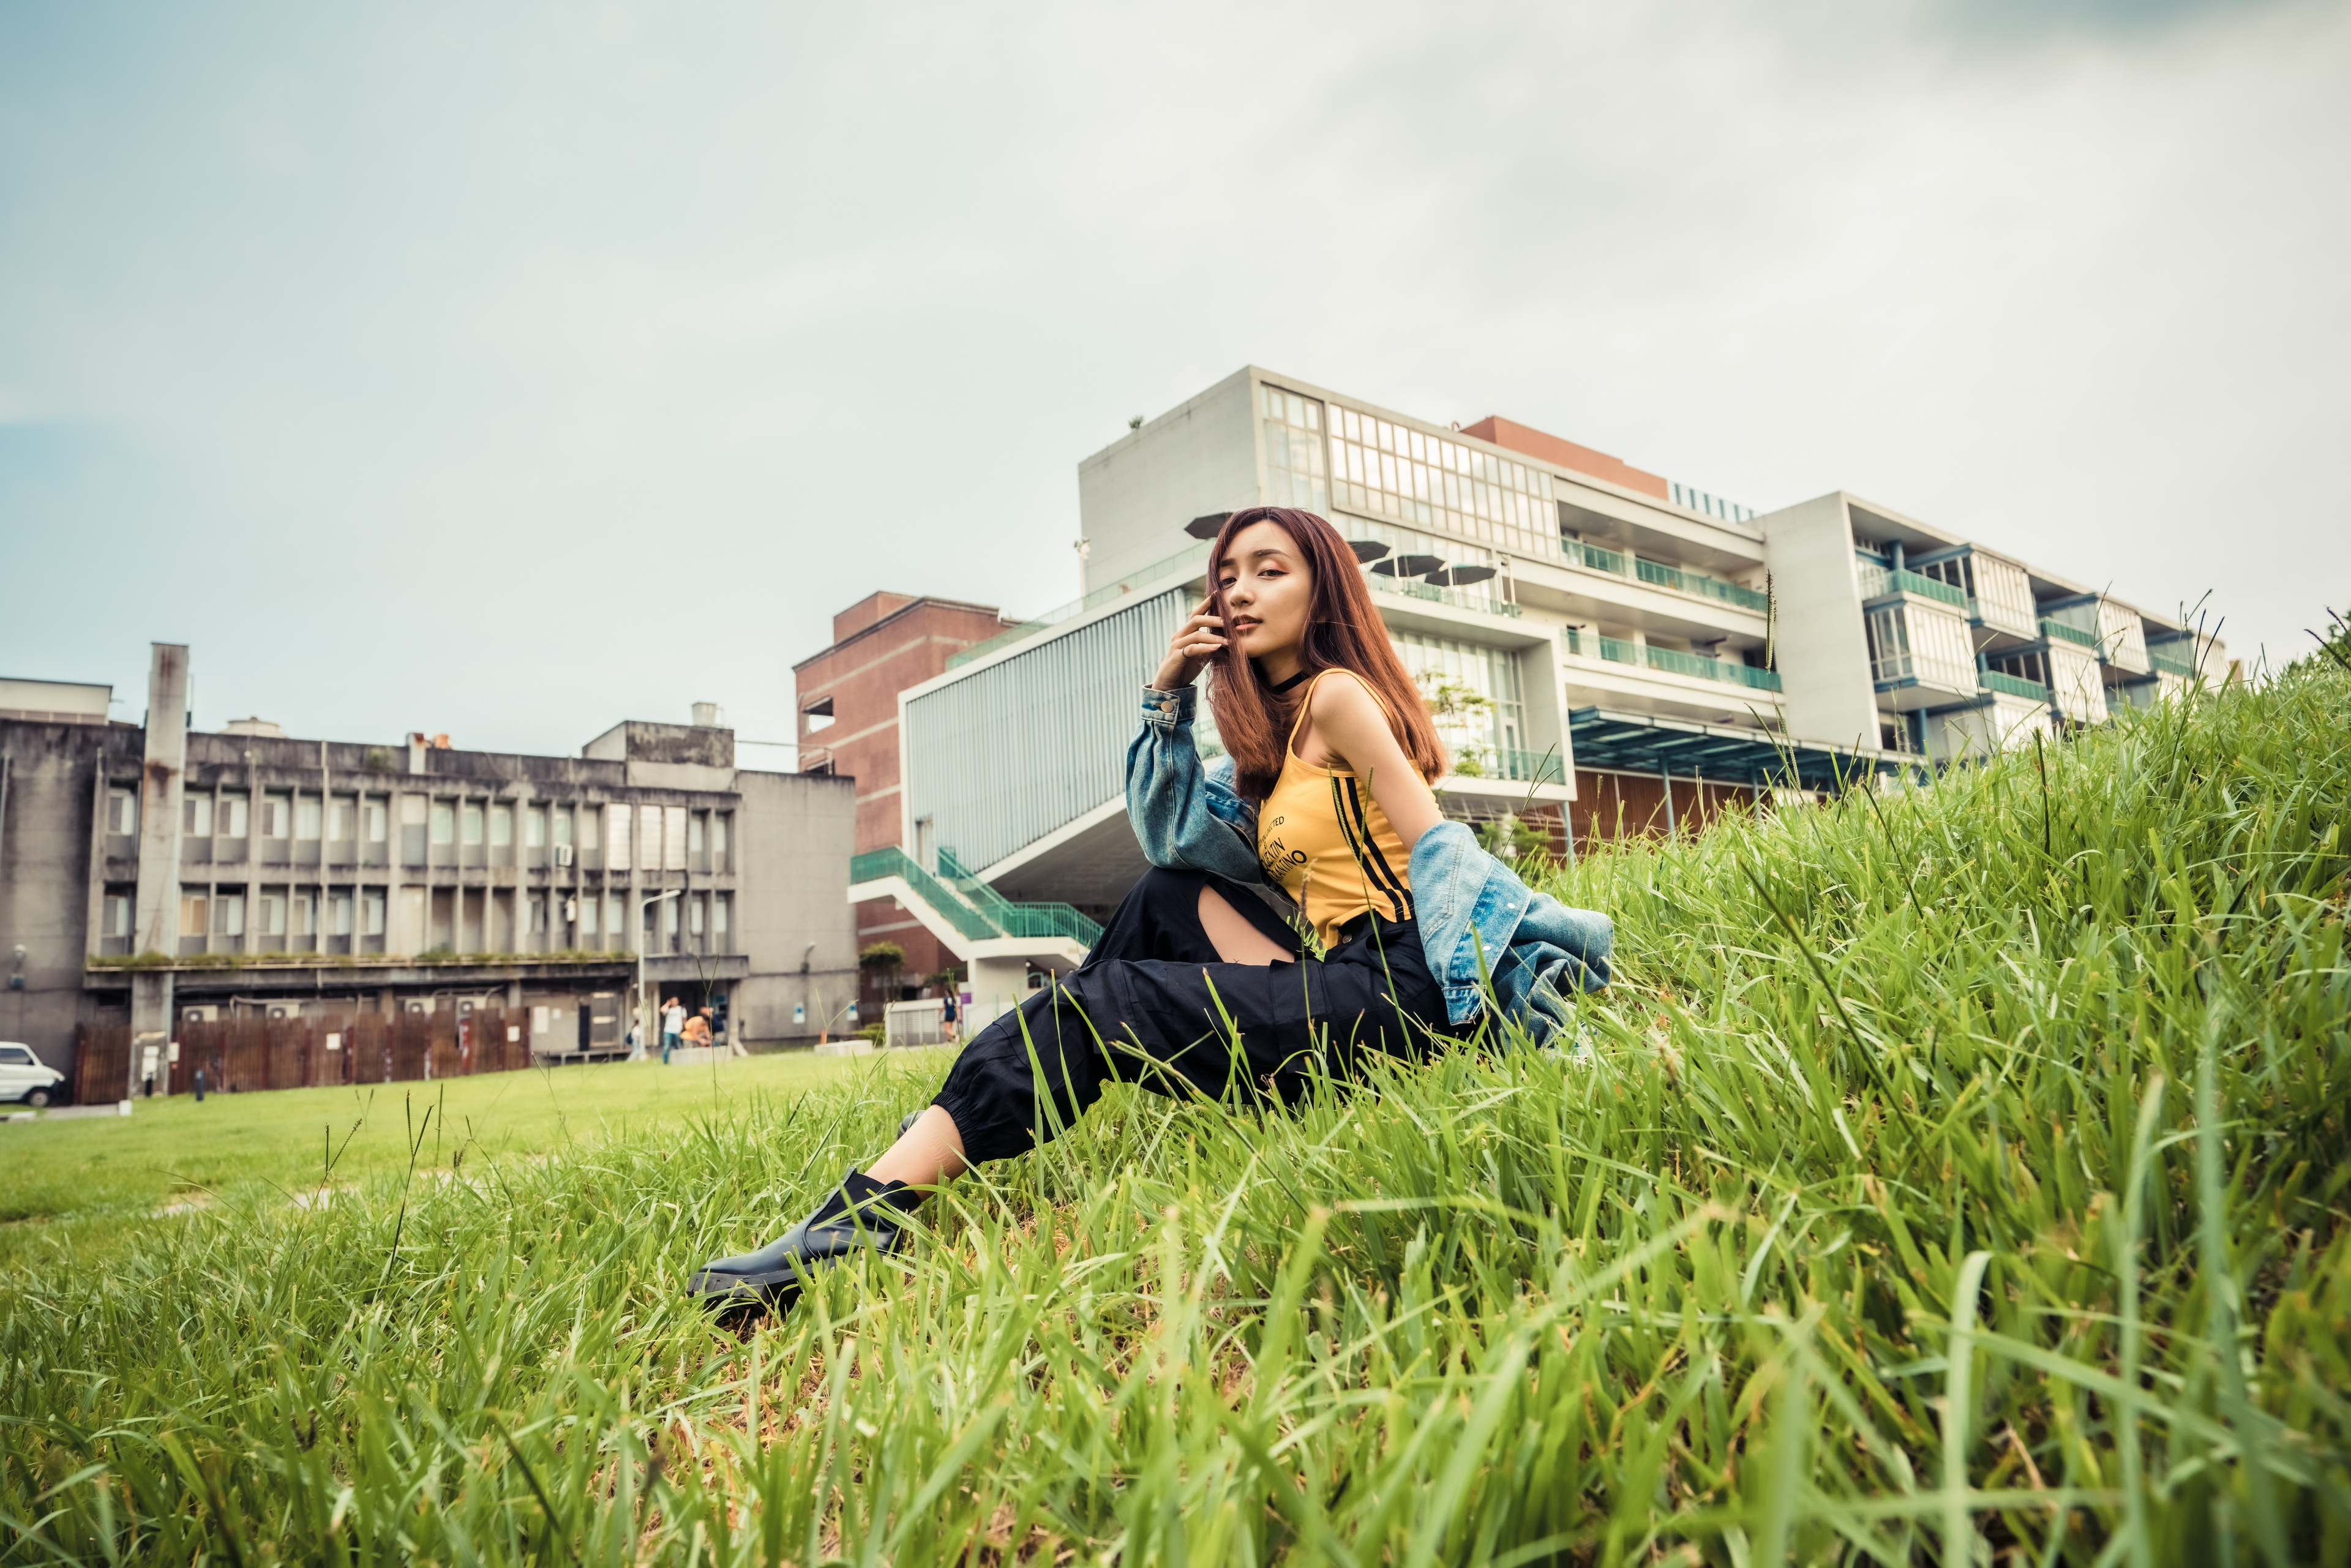 Asian Women Model Long Hair Brunette Grass Sitting Black Pants Depth Of Field Yellow Shirt Jeans Jac 3840x2561